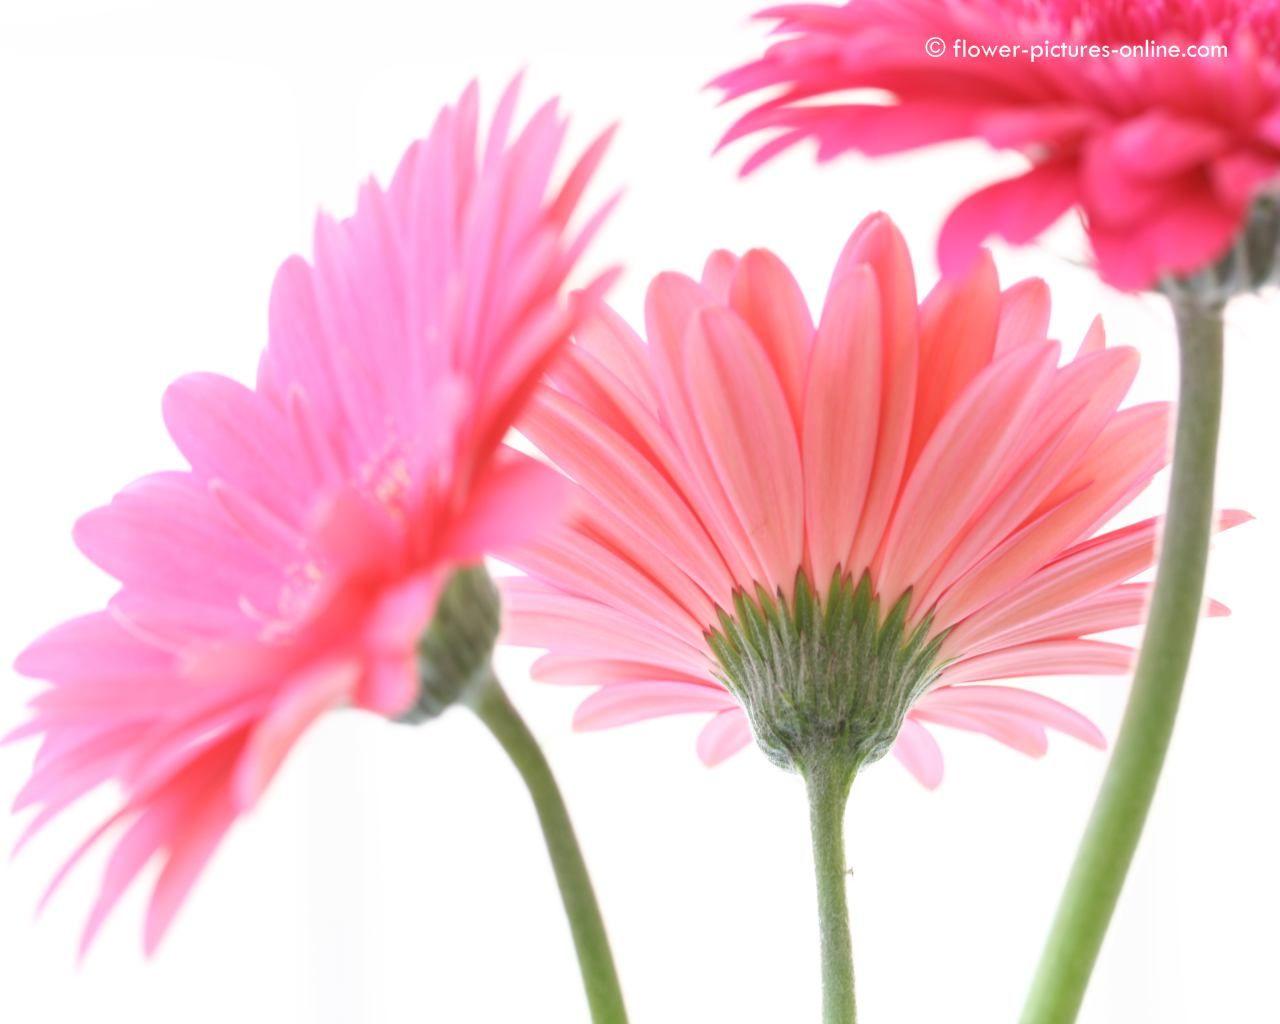 gerbera daisies wallpapers wallpaper | hd wallpapers | pinterest